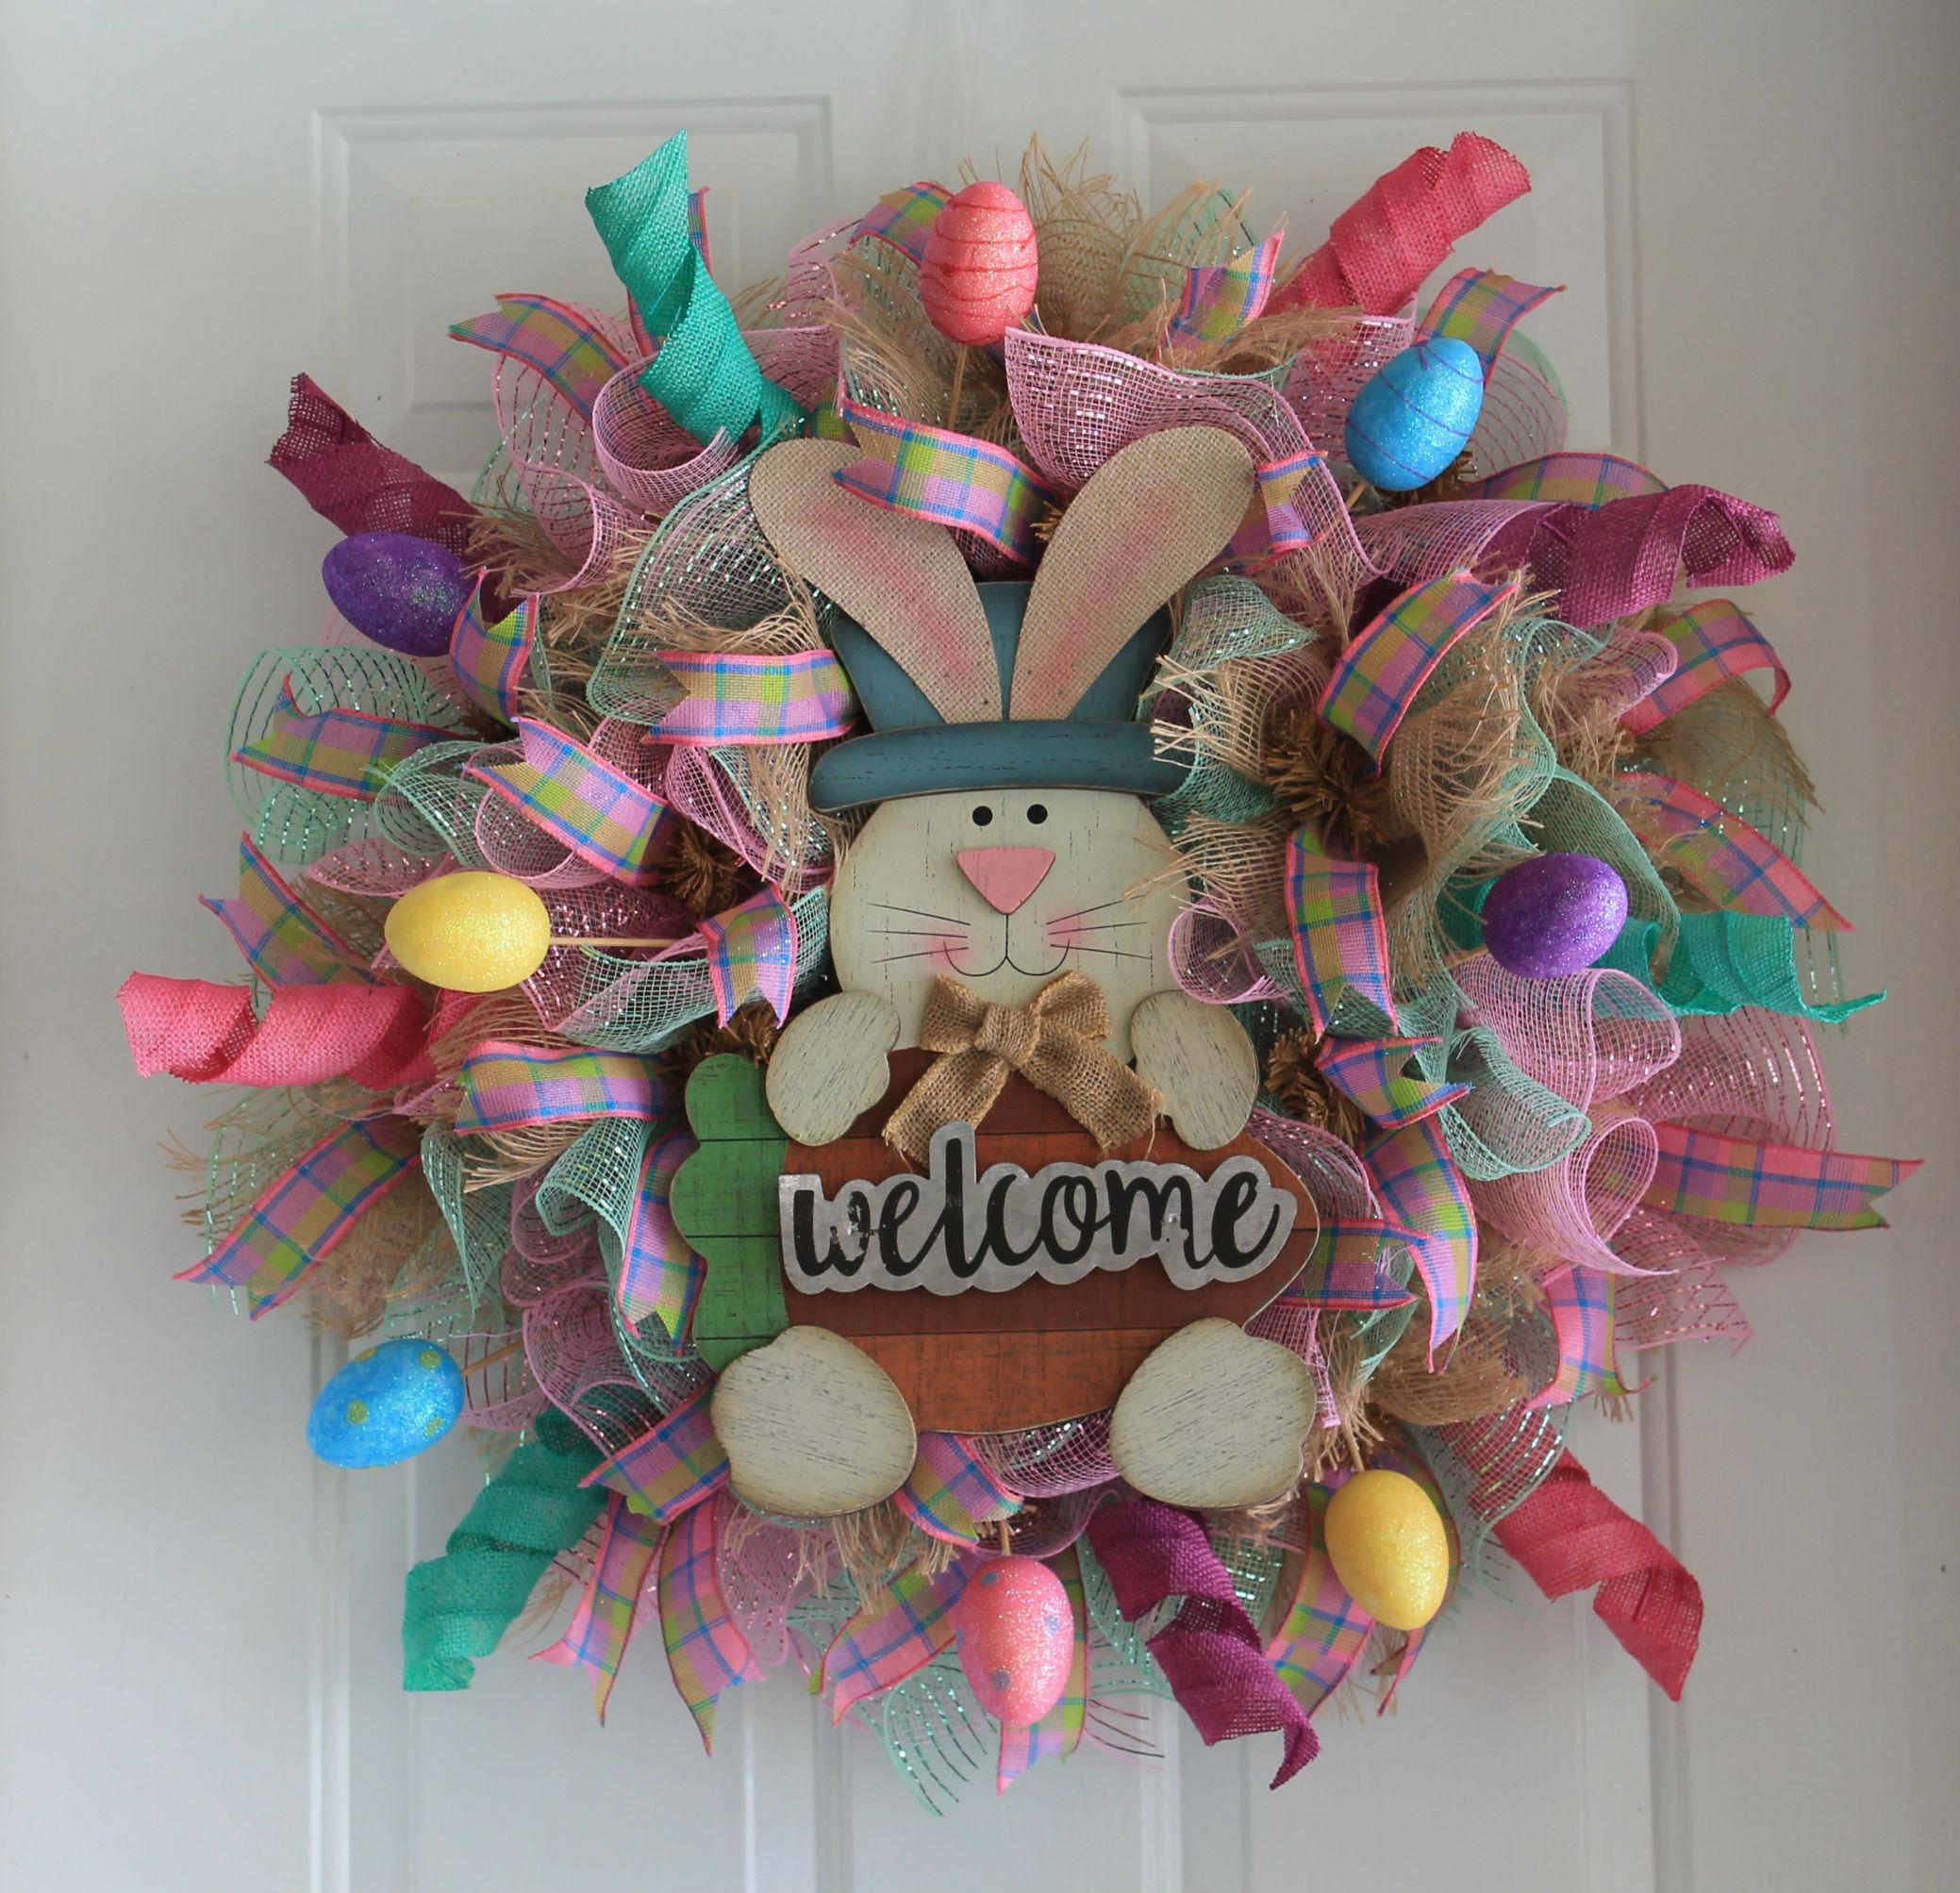 diy welcome easter bunny mesh wreath the wreath depot. Black Bedroom Furniture Sets. Home Design Ideas